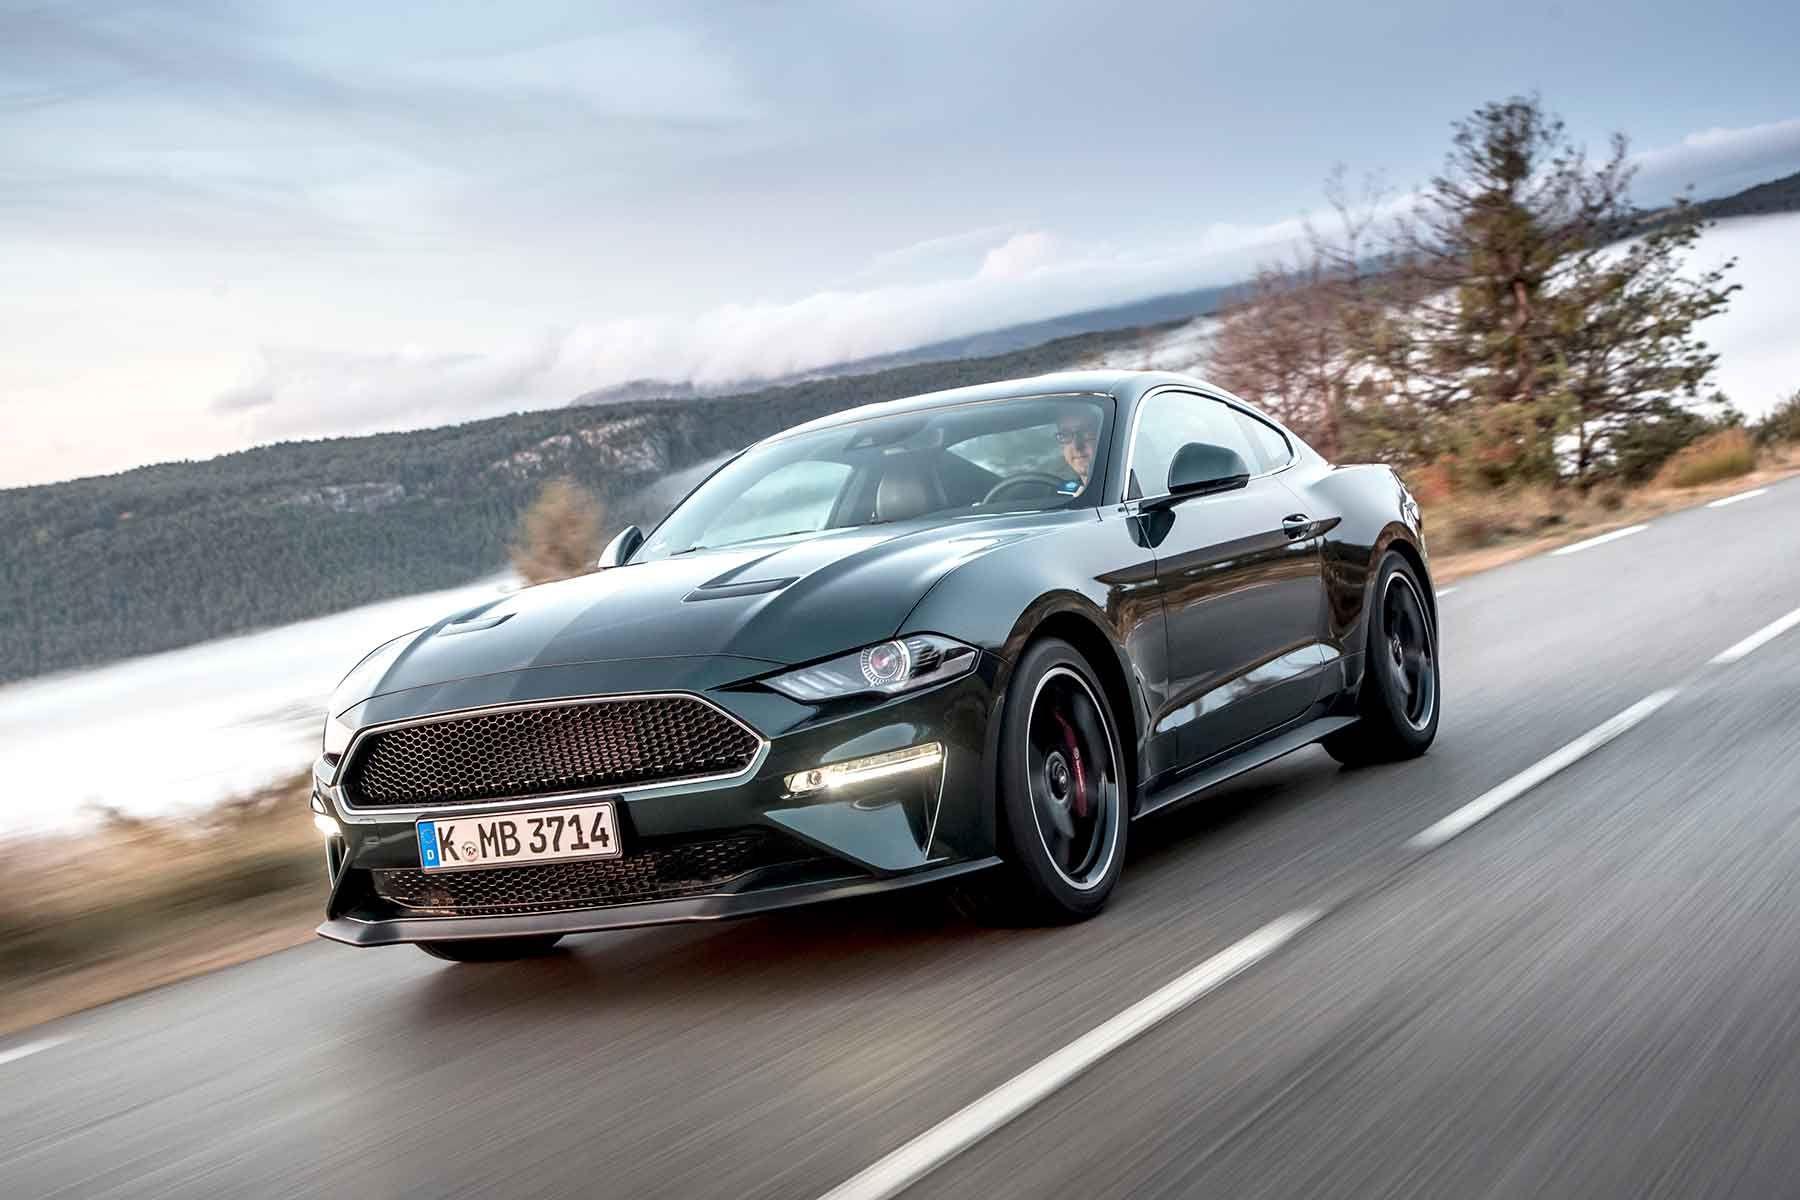 Ford mustang bullitt 2018 review v8 muscle hollywood cool logbookloans finance loans